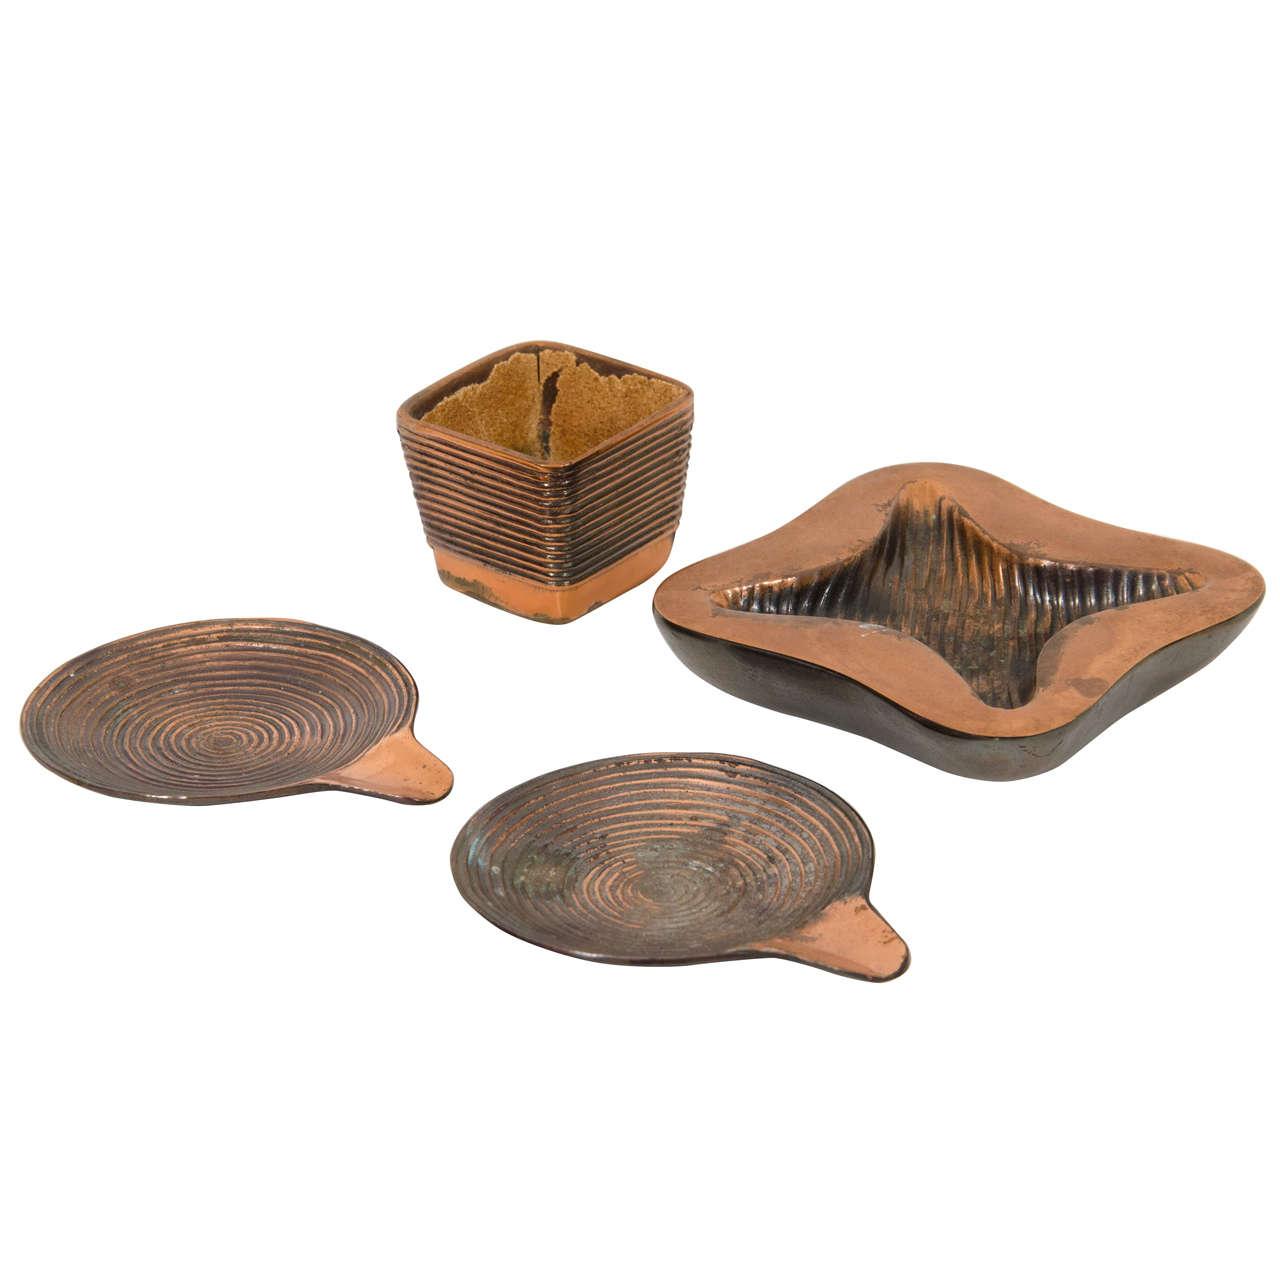 Ben Seibel for Jenfredware Four-Piece Copper Smoking Set